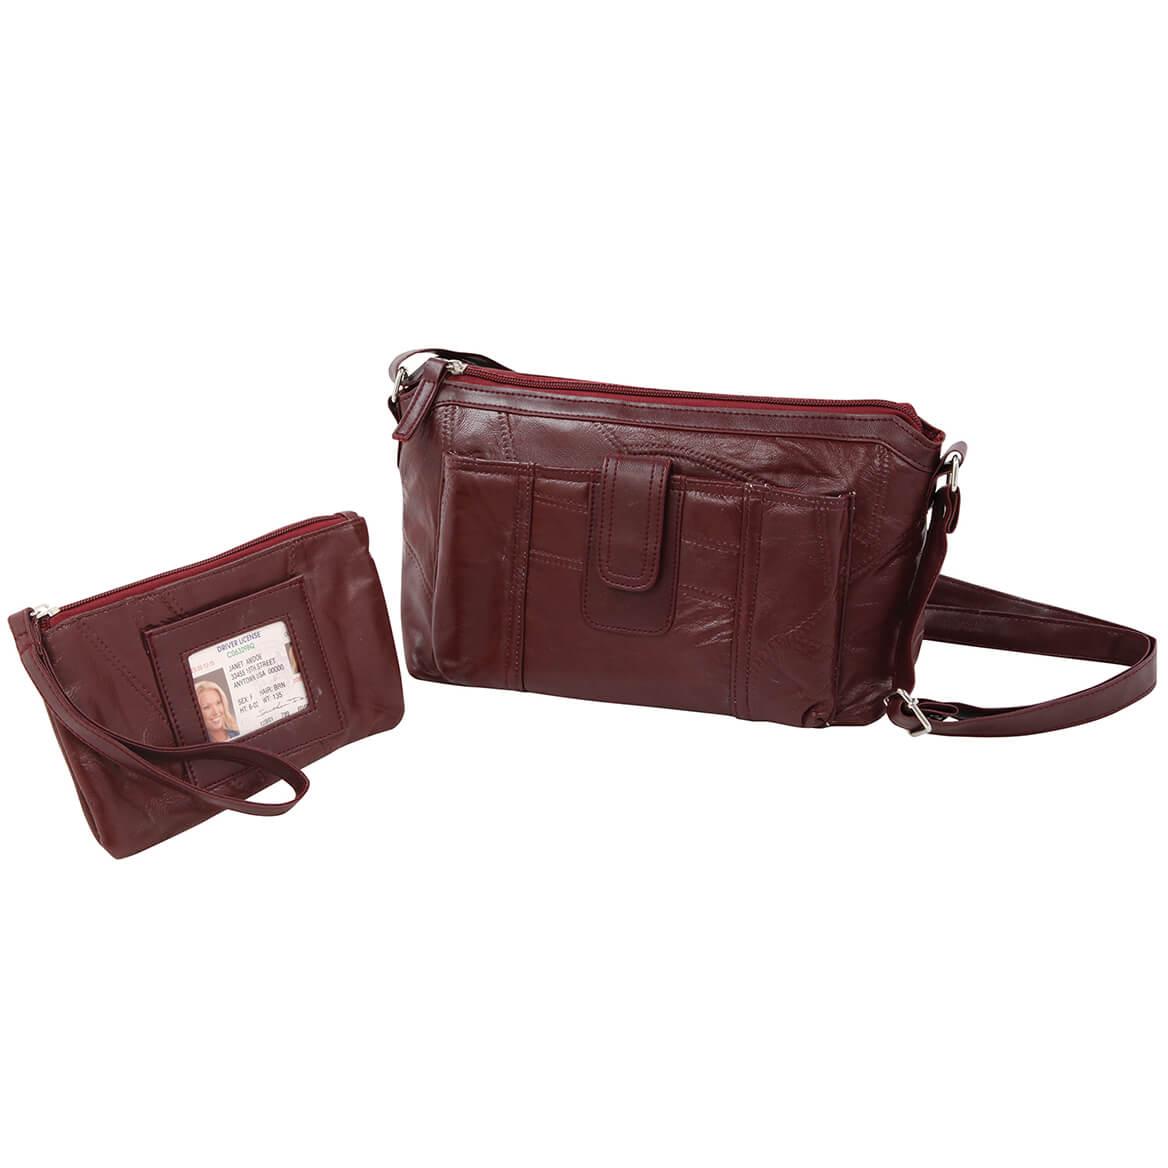 Wallaby Wristlet Handbag-369948